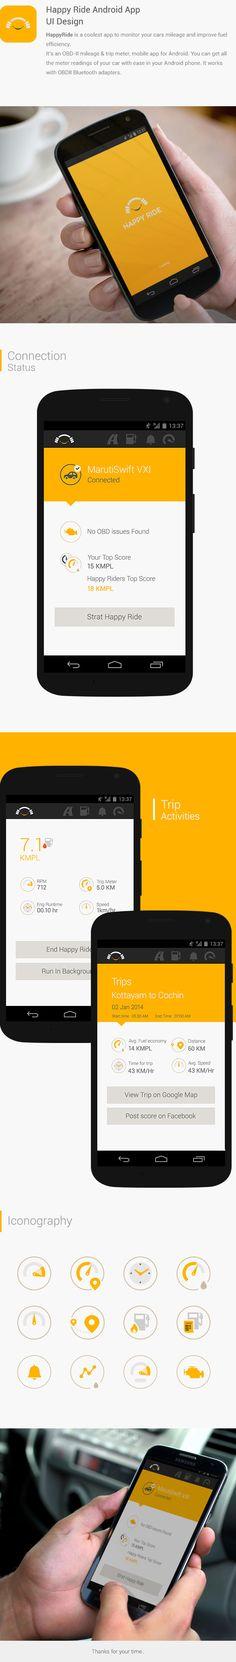 Happy Ride - Android App by vijilal tharaniyil, via Behance Mobile Ui Design, App Ui Design, Web Design, Android App Icon, Android Ui, Ios App, App Promotion, Mobile App Ui, Ui Design Inspiration